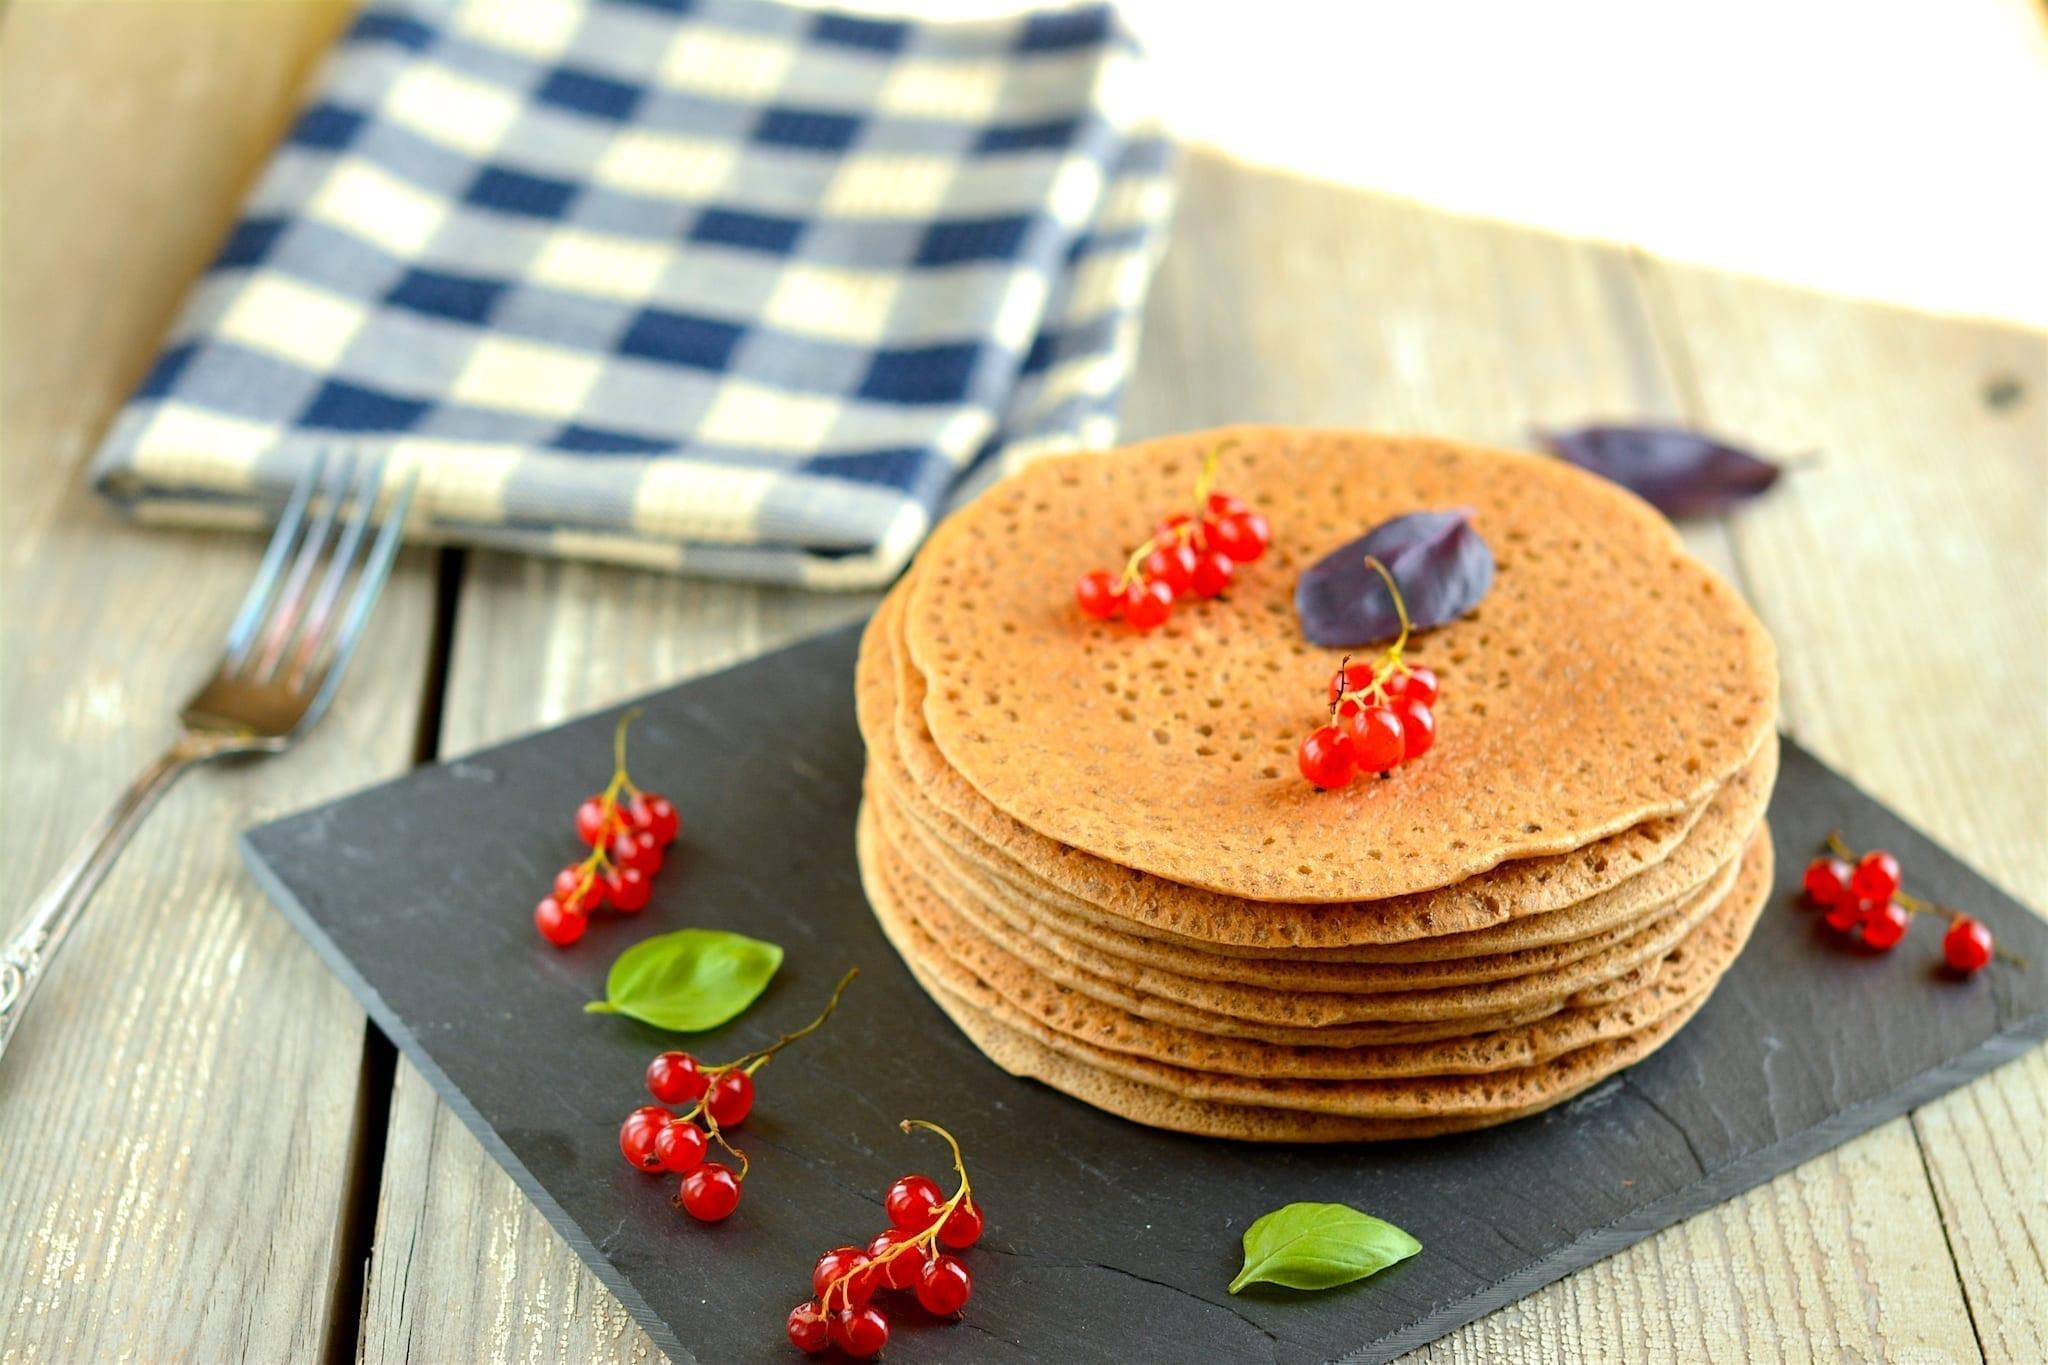 pancakes-buckwheat-candida fighting, vegan candida diet meal plans